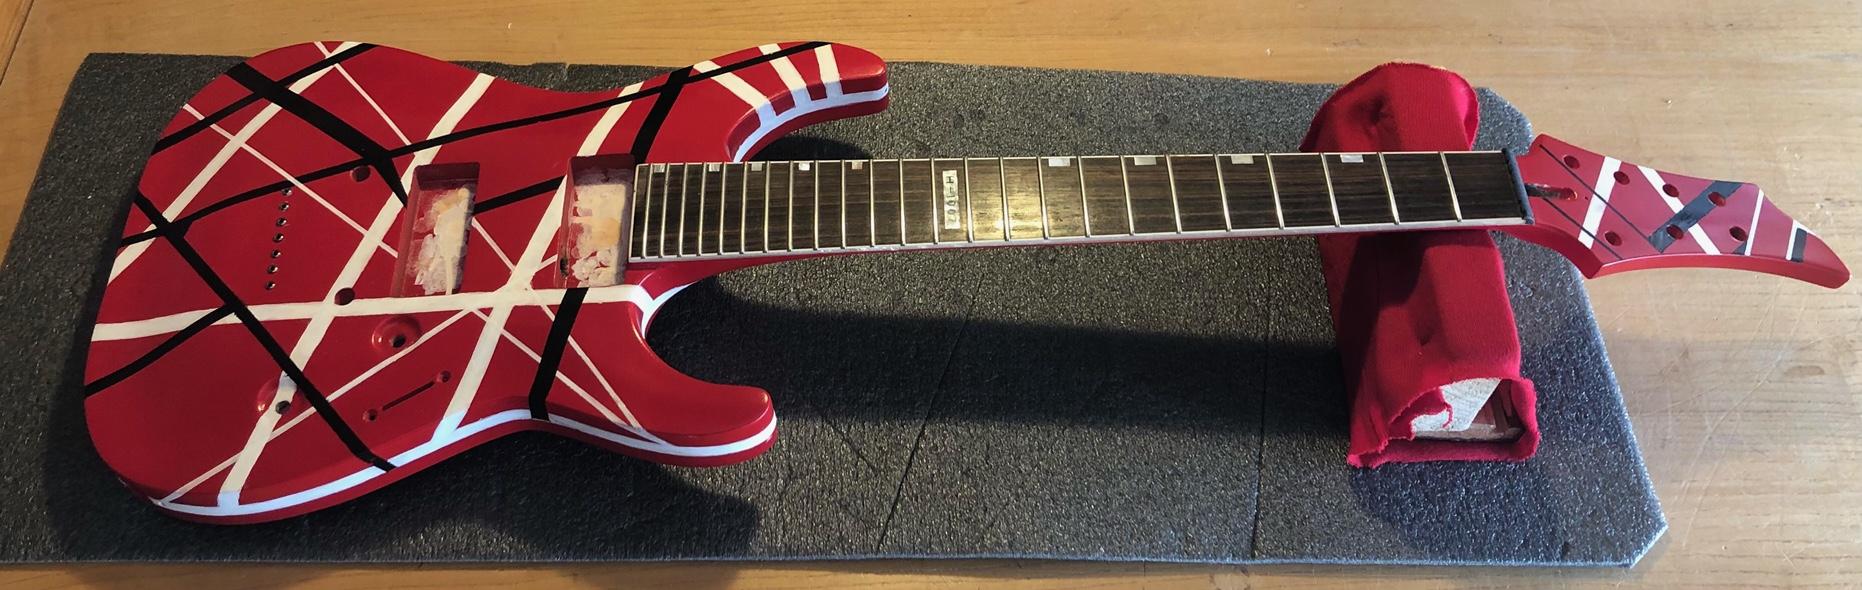 EVH Guitar Build Project